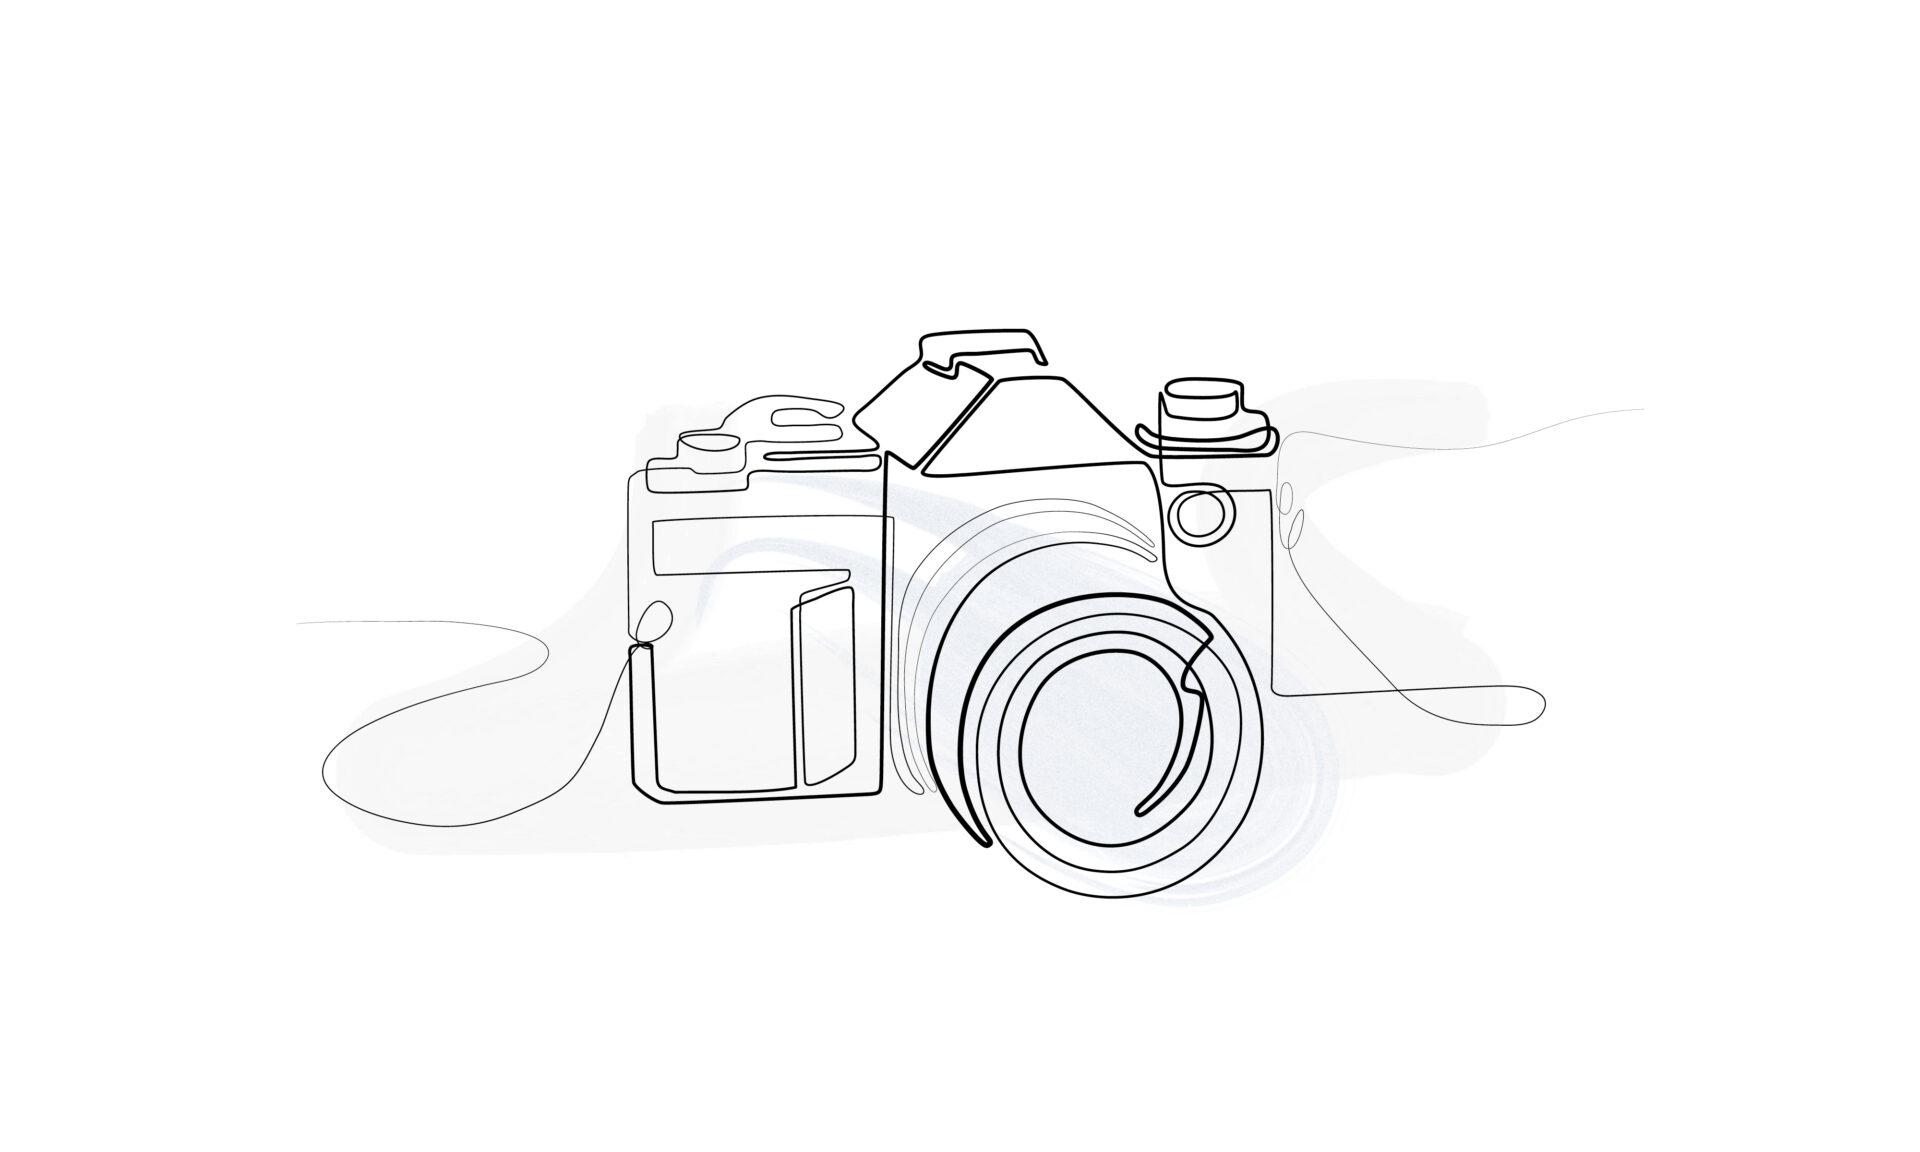 Skizze eines Fotoapparats